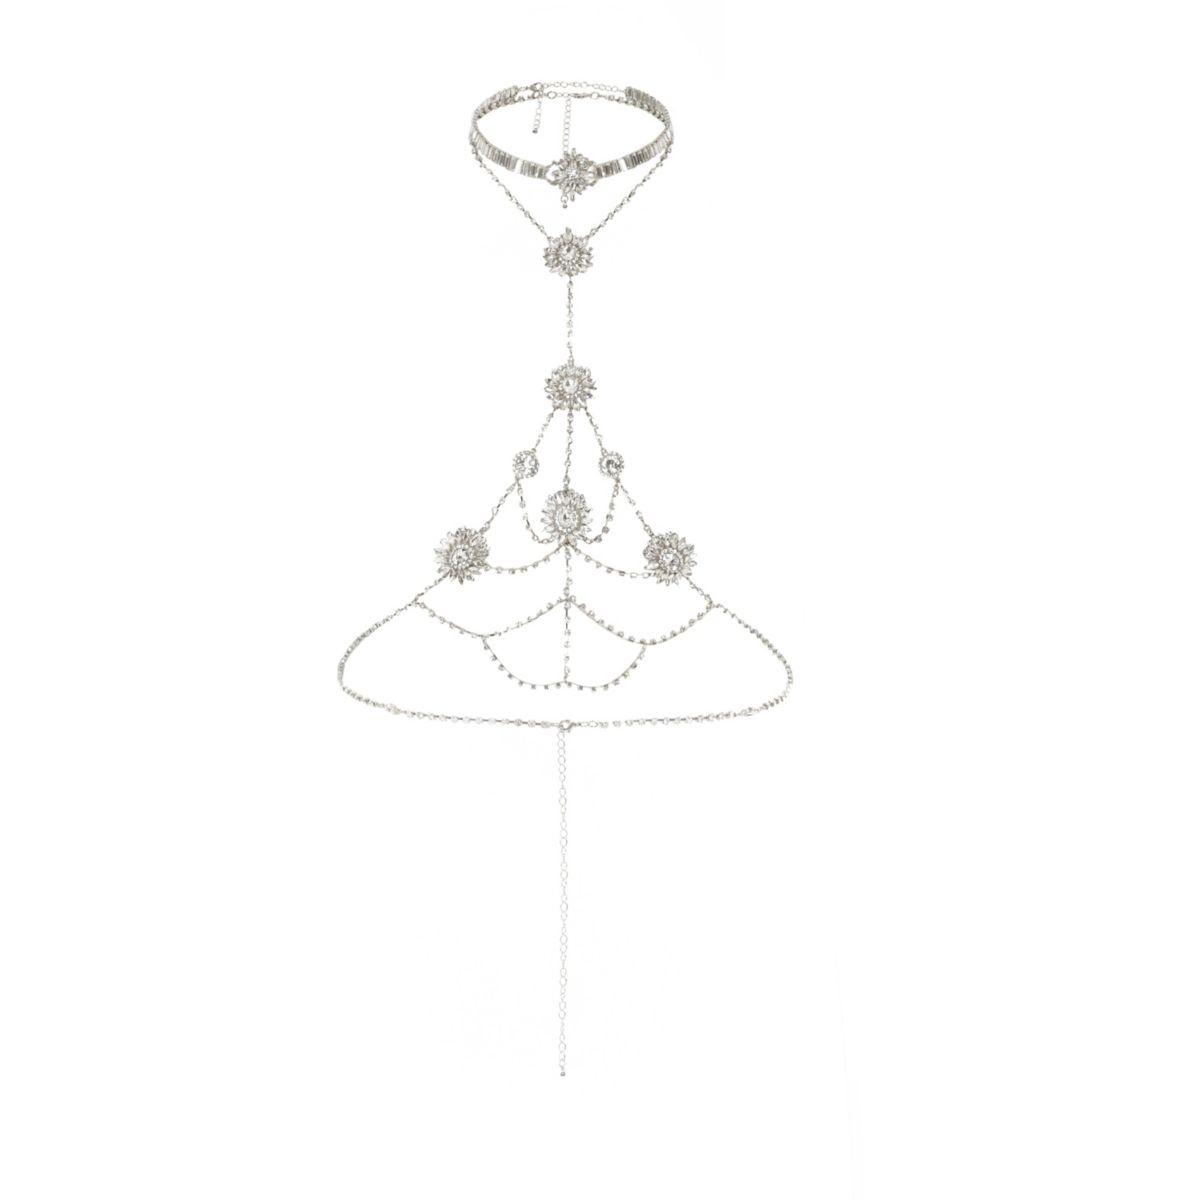 Silver tone rhinestone harness necklace set